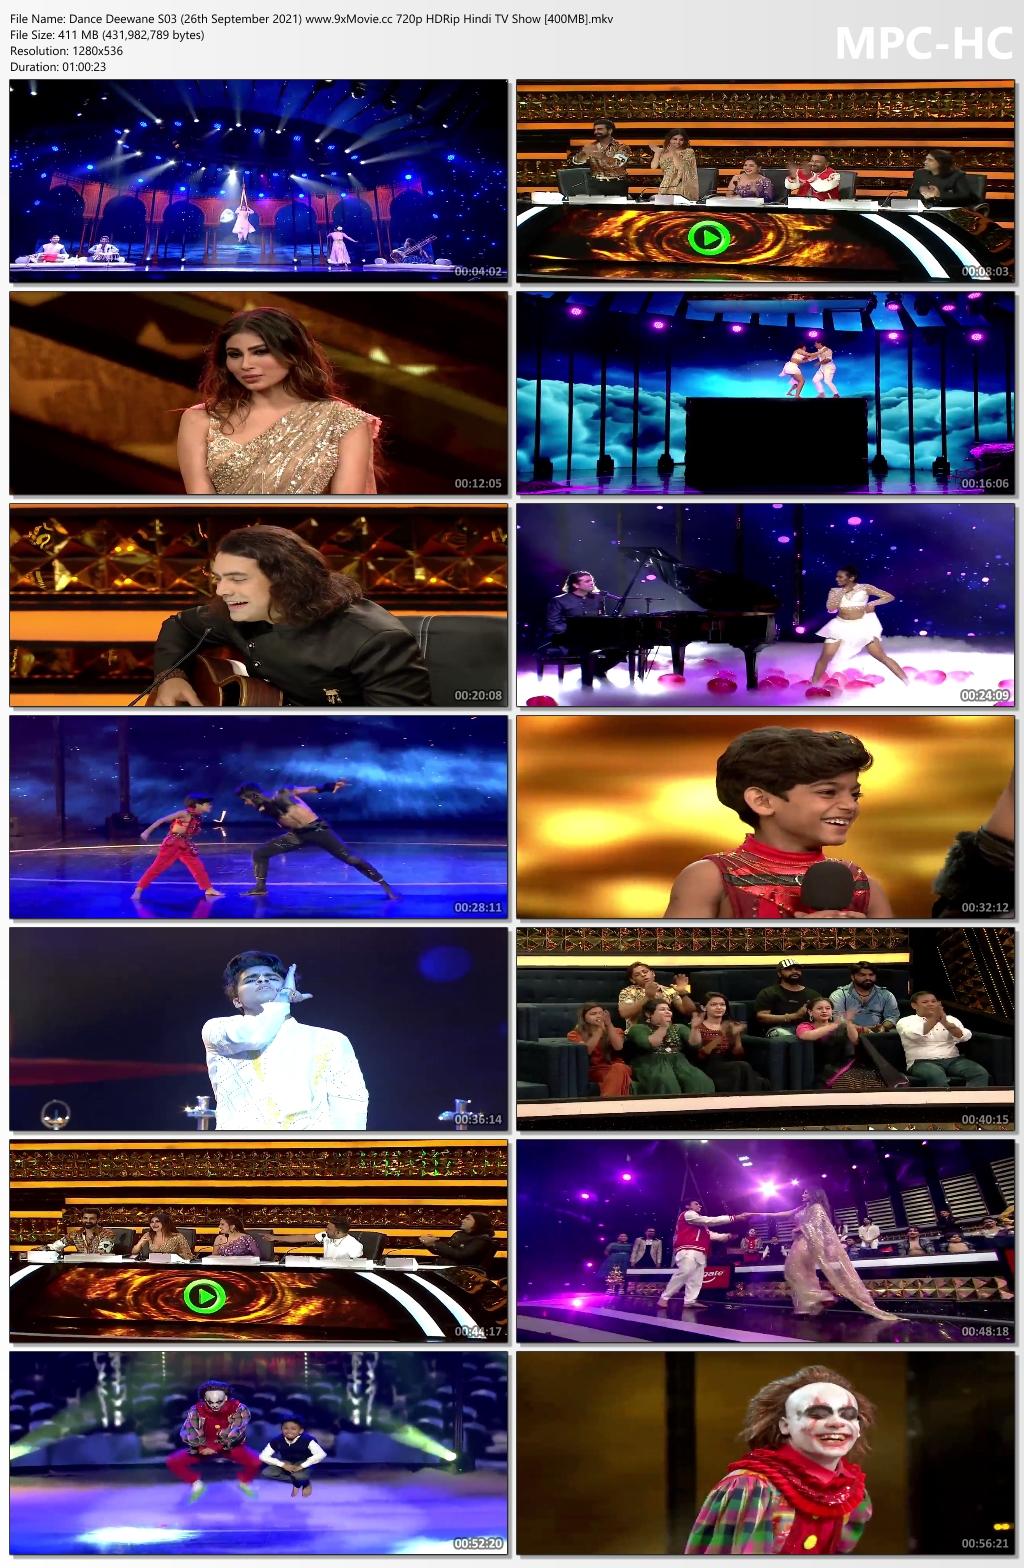 Dance-Deewane-S03-26th-September-2021-www-9x-Movie-cc-720p-HDRip-Hindi-TV-Show-400-MB-mkv